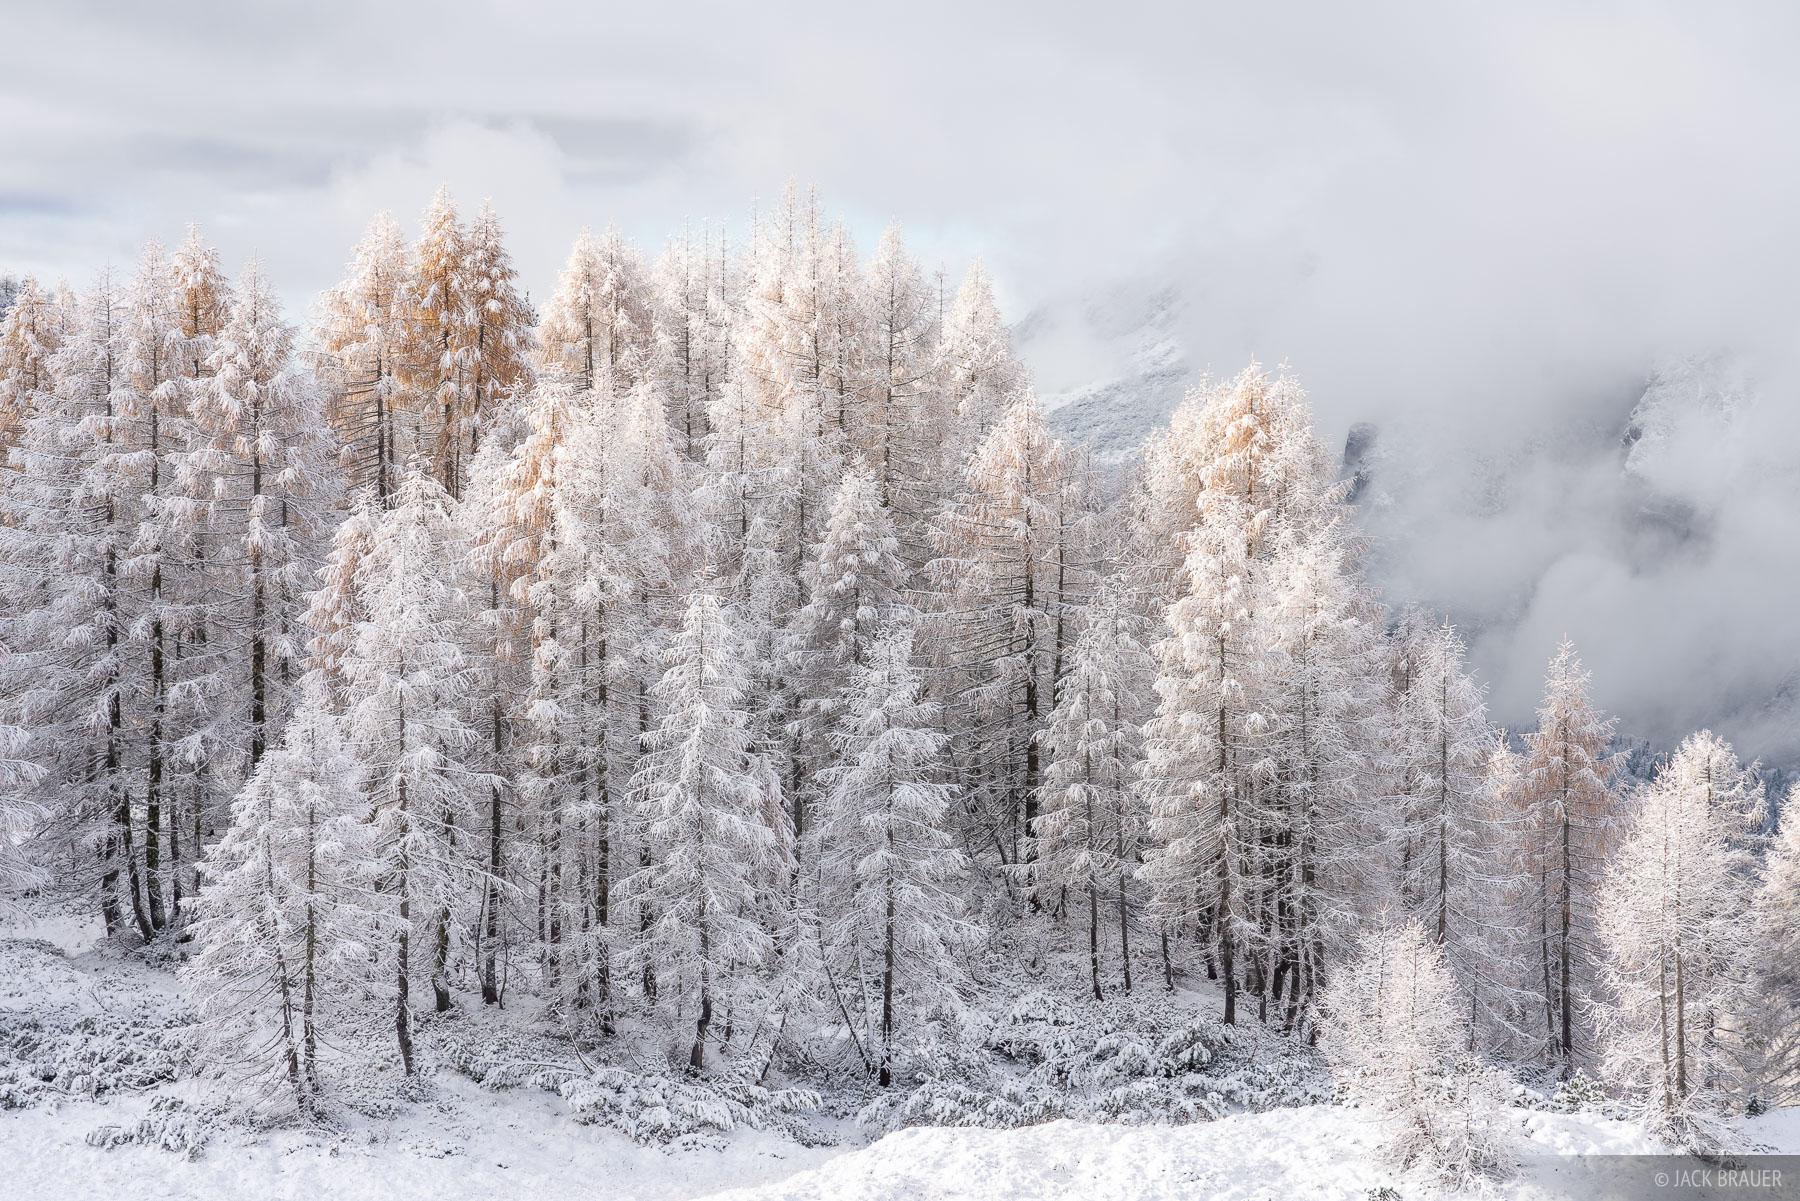 Dolomites, Italy, Parco Naturale delle Dolomiti Fruilane, larch, November, Alps, photo